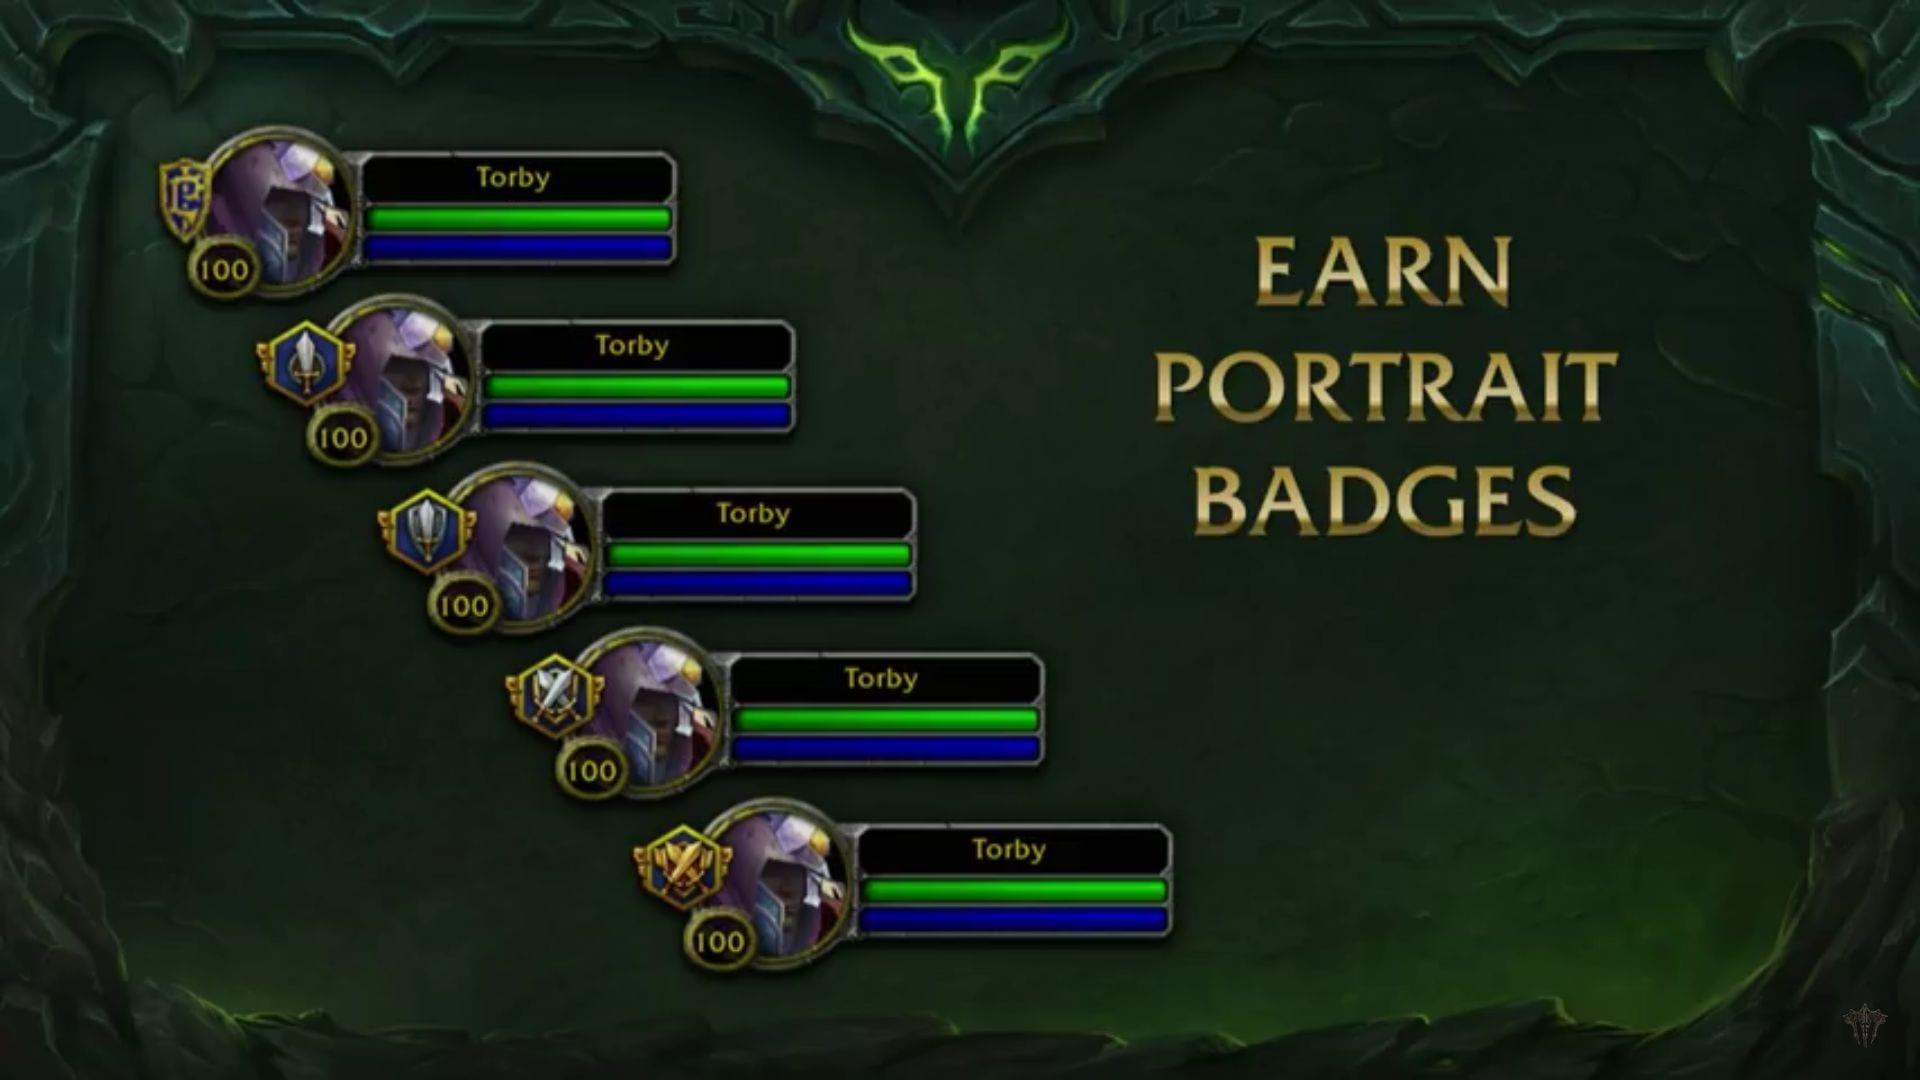 sistema de honor retratos prestigio